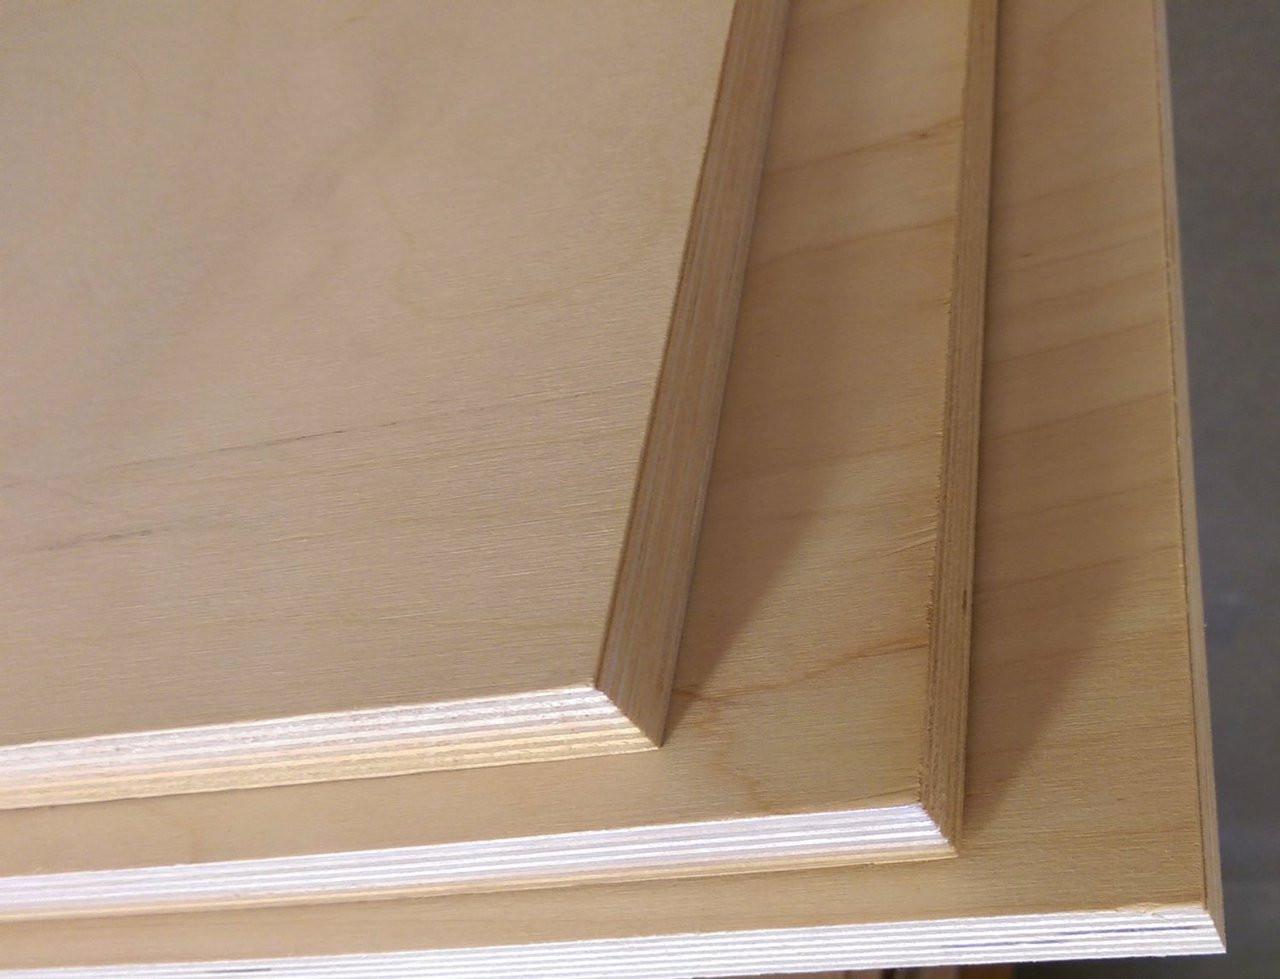 baltic birch plywood pro - HD1280×979